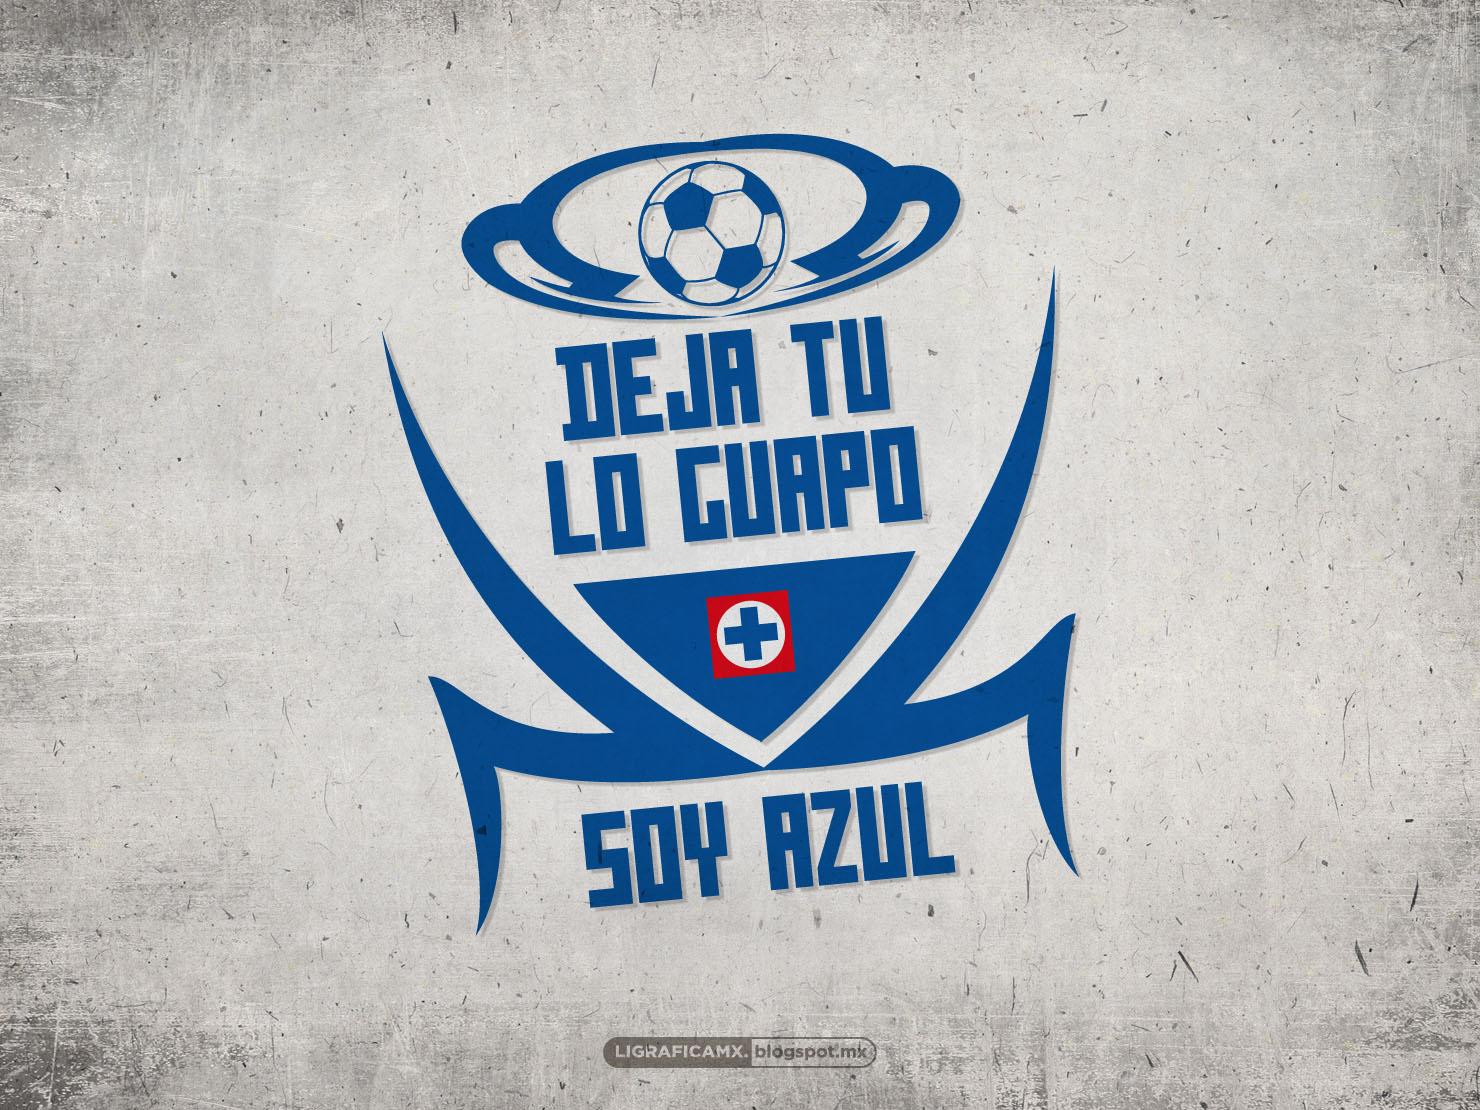 Cruz Azul HD Wallpapers Download - Cruz Azul HD Wallpapers 1.3 ...